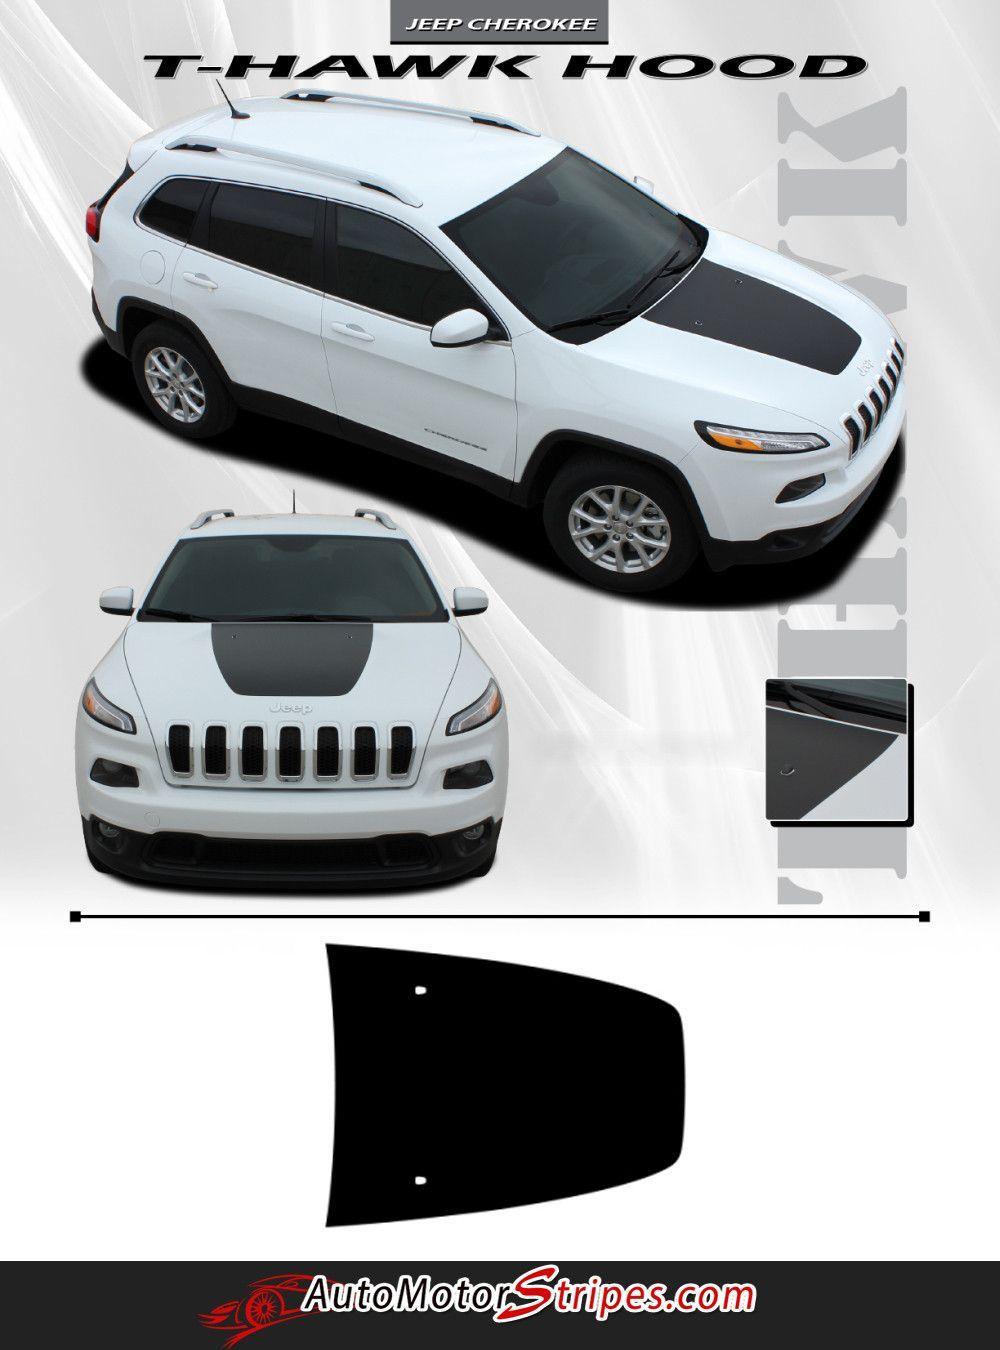 2014 2016 Jeep Cherokee T Hawk Factory Oem Style Center Hood